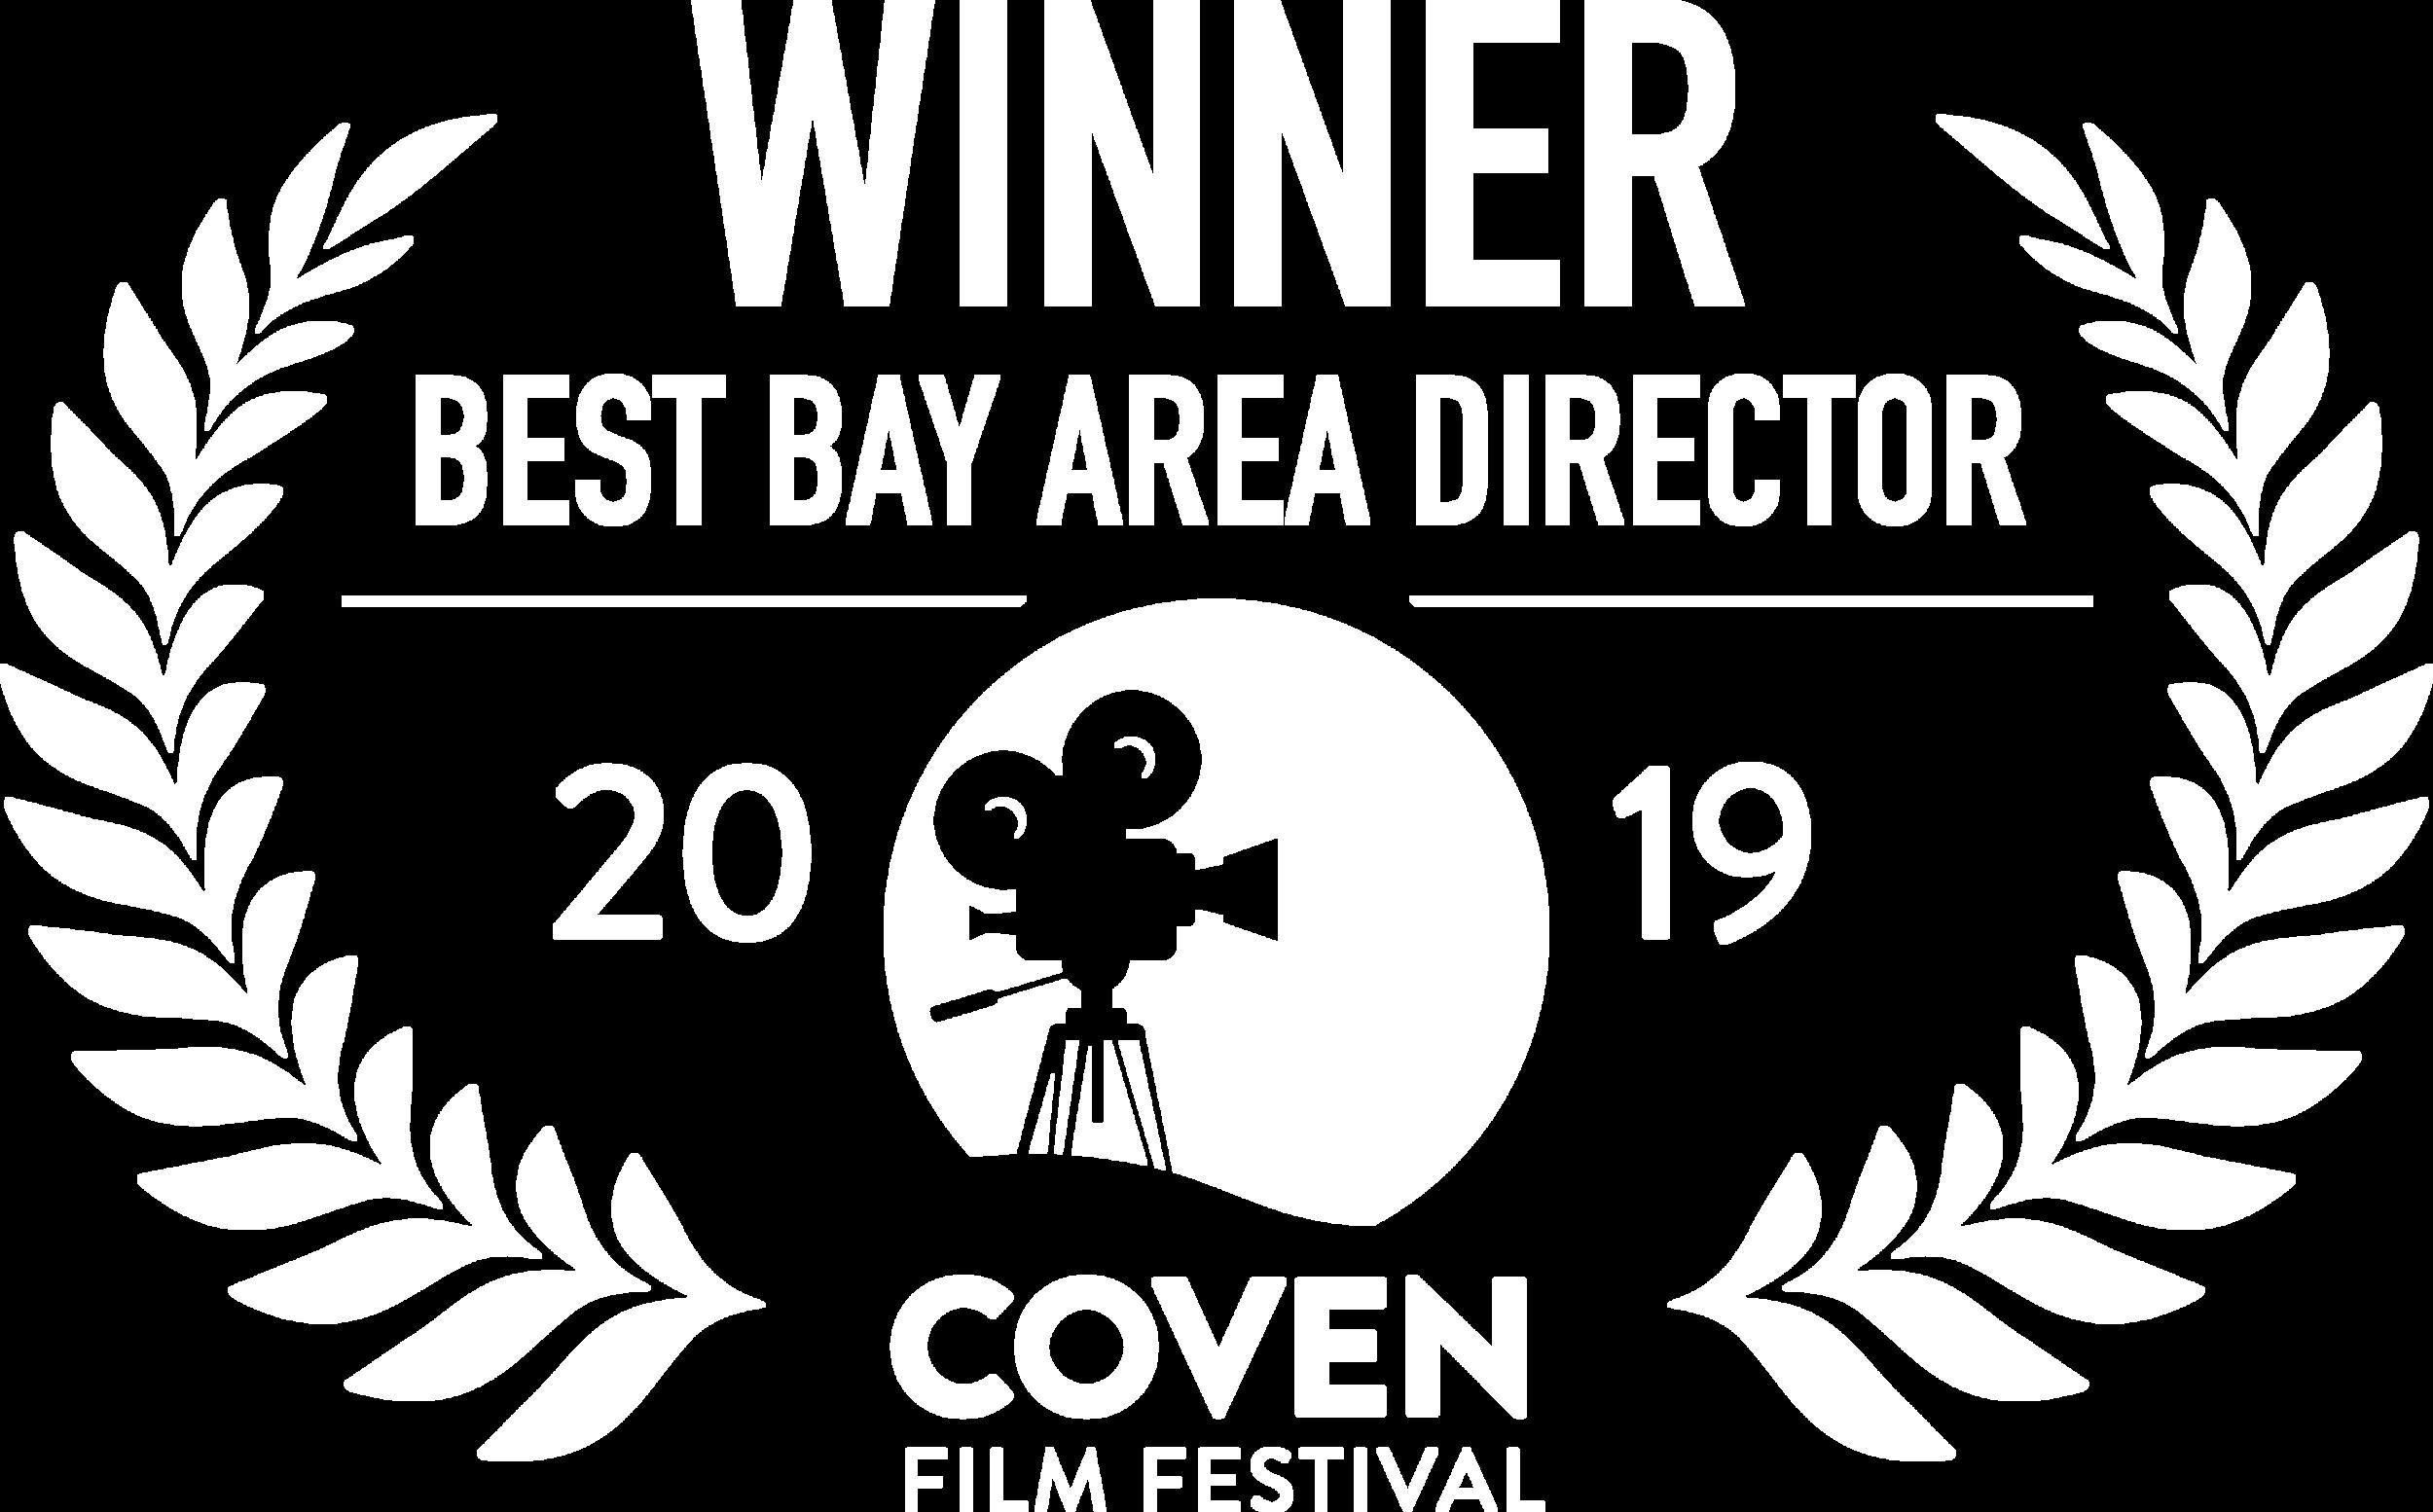 Laurels-White-Best Bay Area Director.png